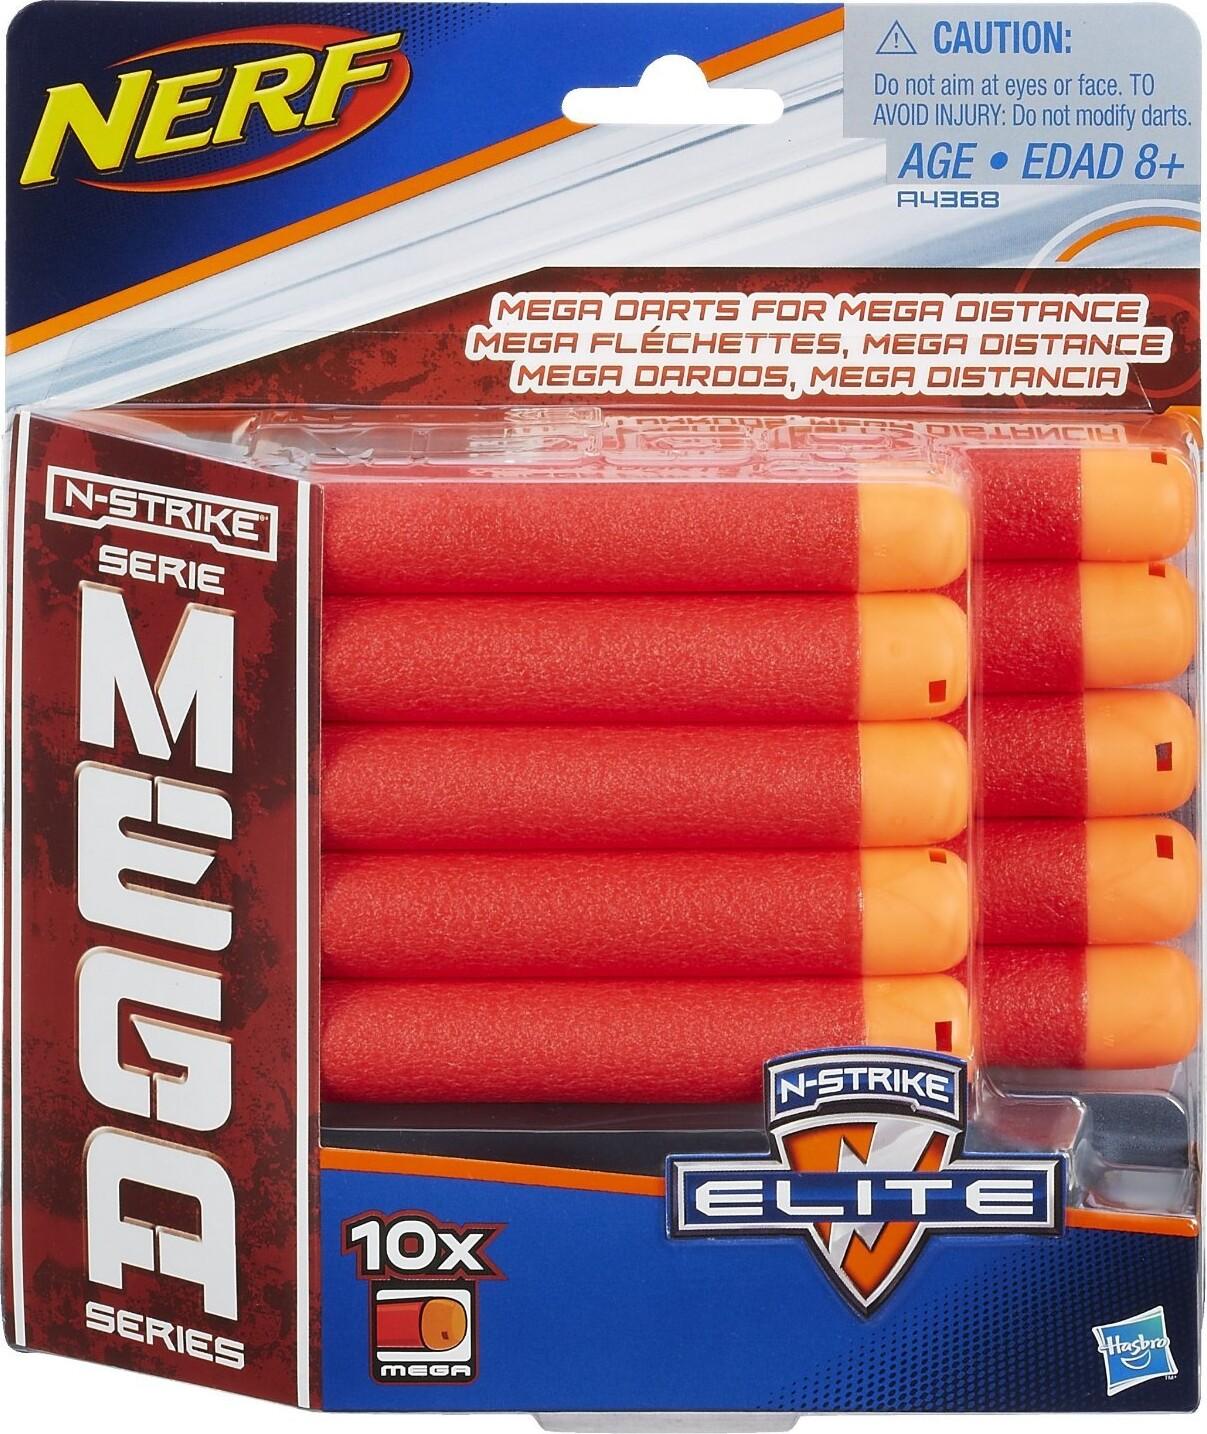 (A4368), nerf blaster, legetøjsvåben, legetøjspistoler, nerf gun shop, hasbro nerf, nerf refill, nerf gun refills